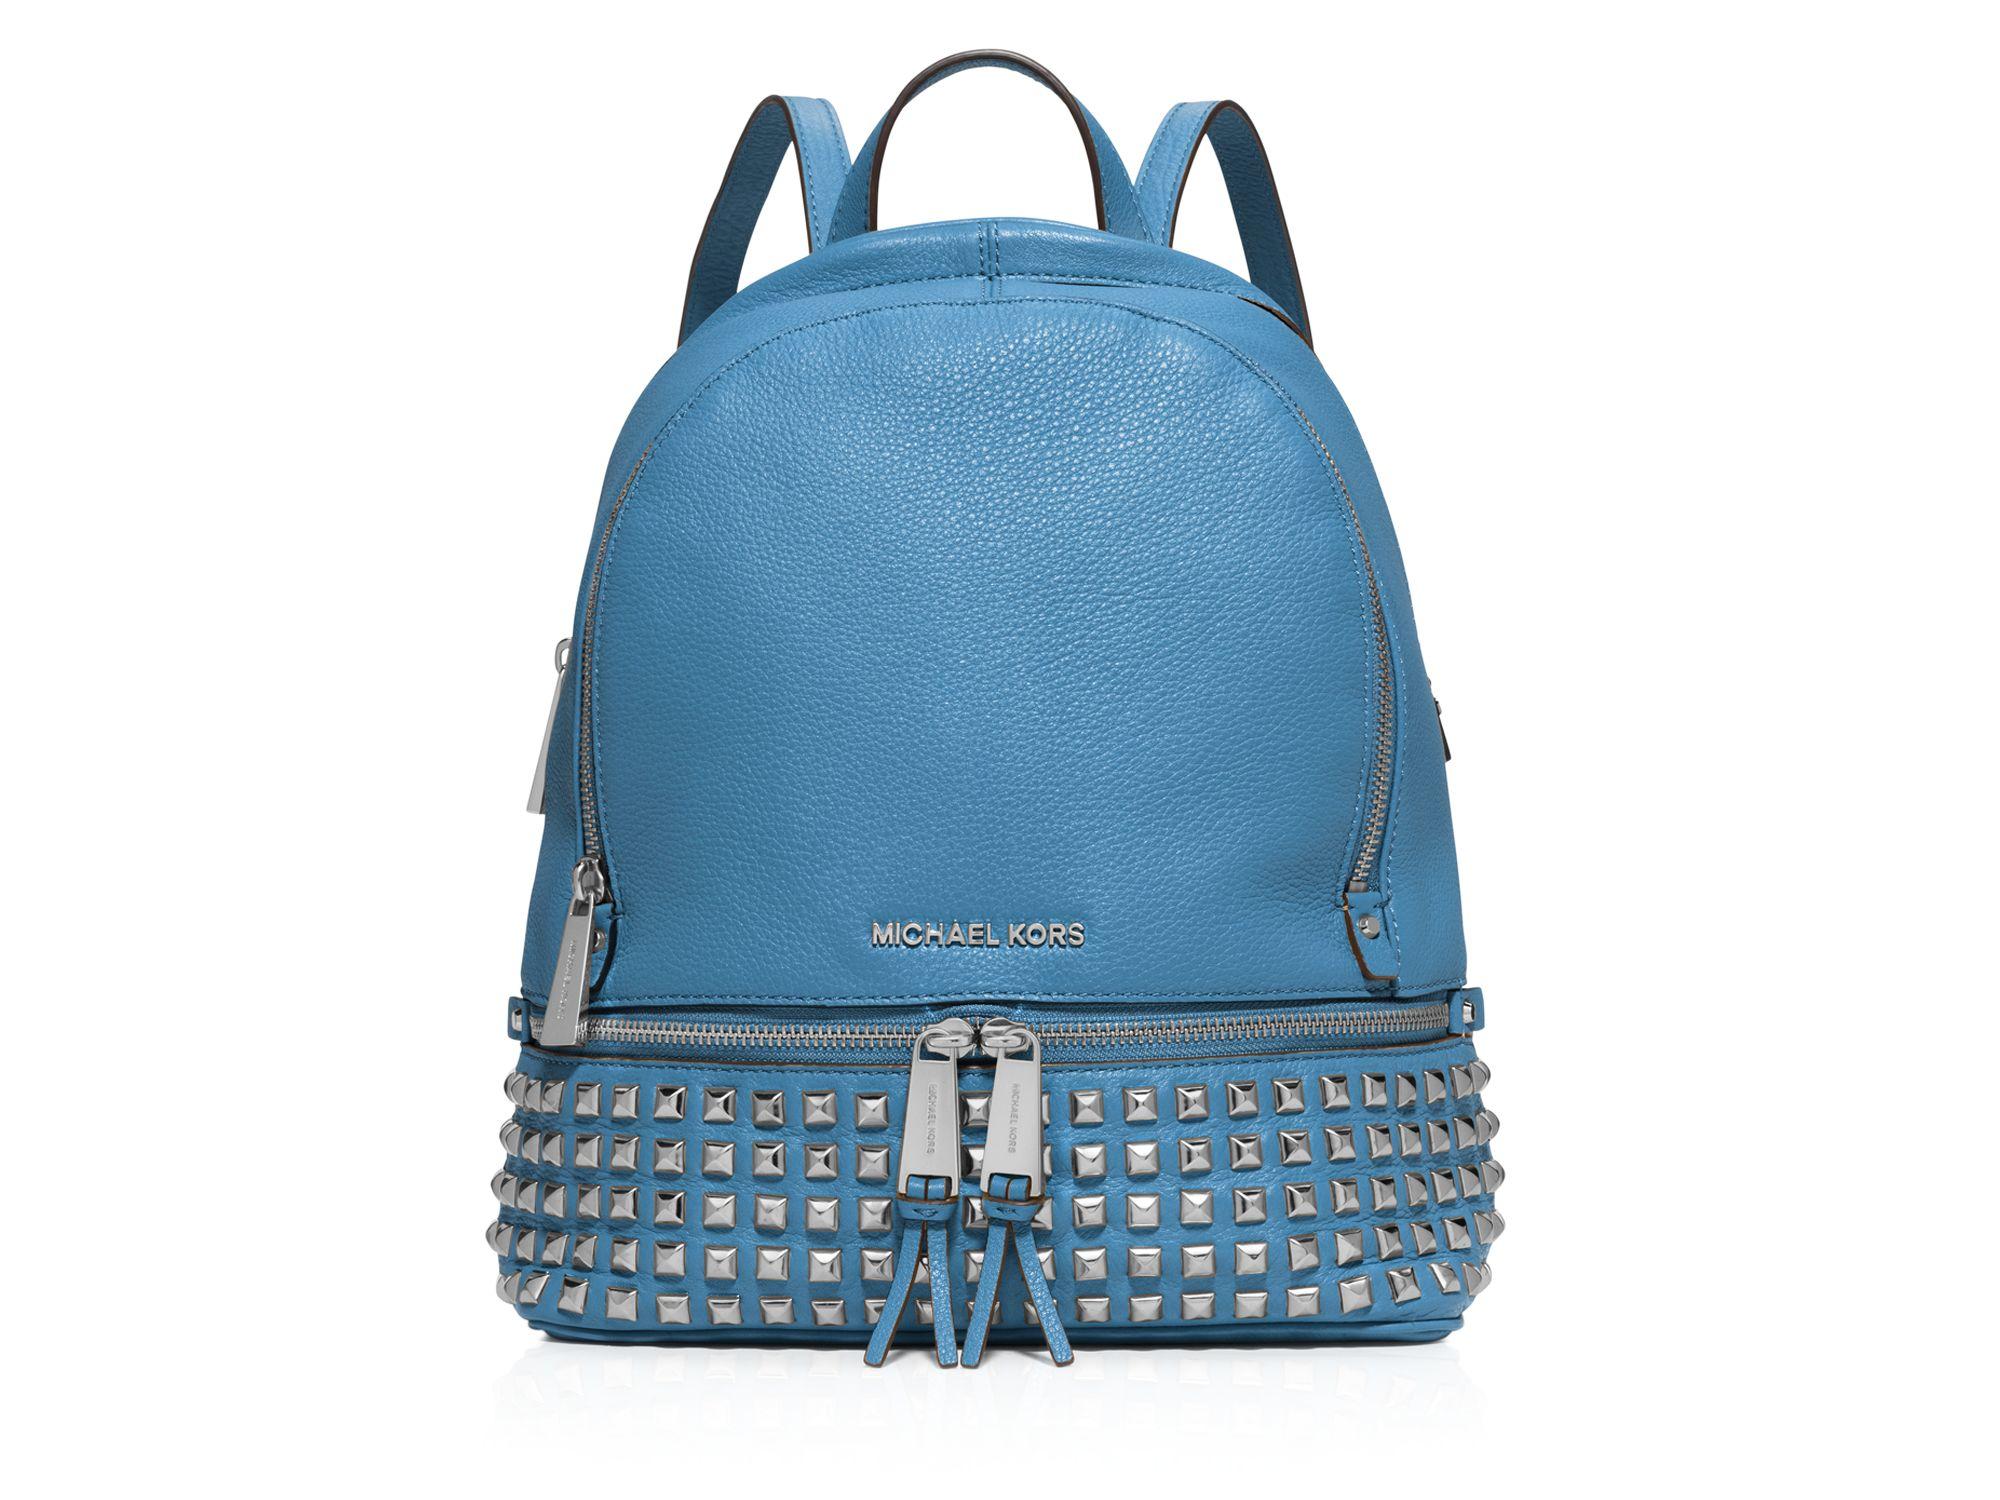 8e459f9254fc ... Michael michael kors Small Rhea Zip Studded Backpack in Blue ...